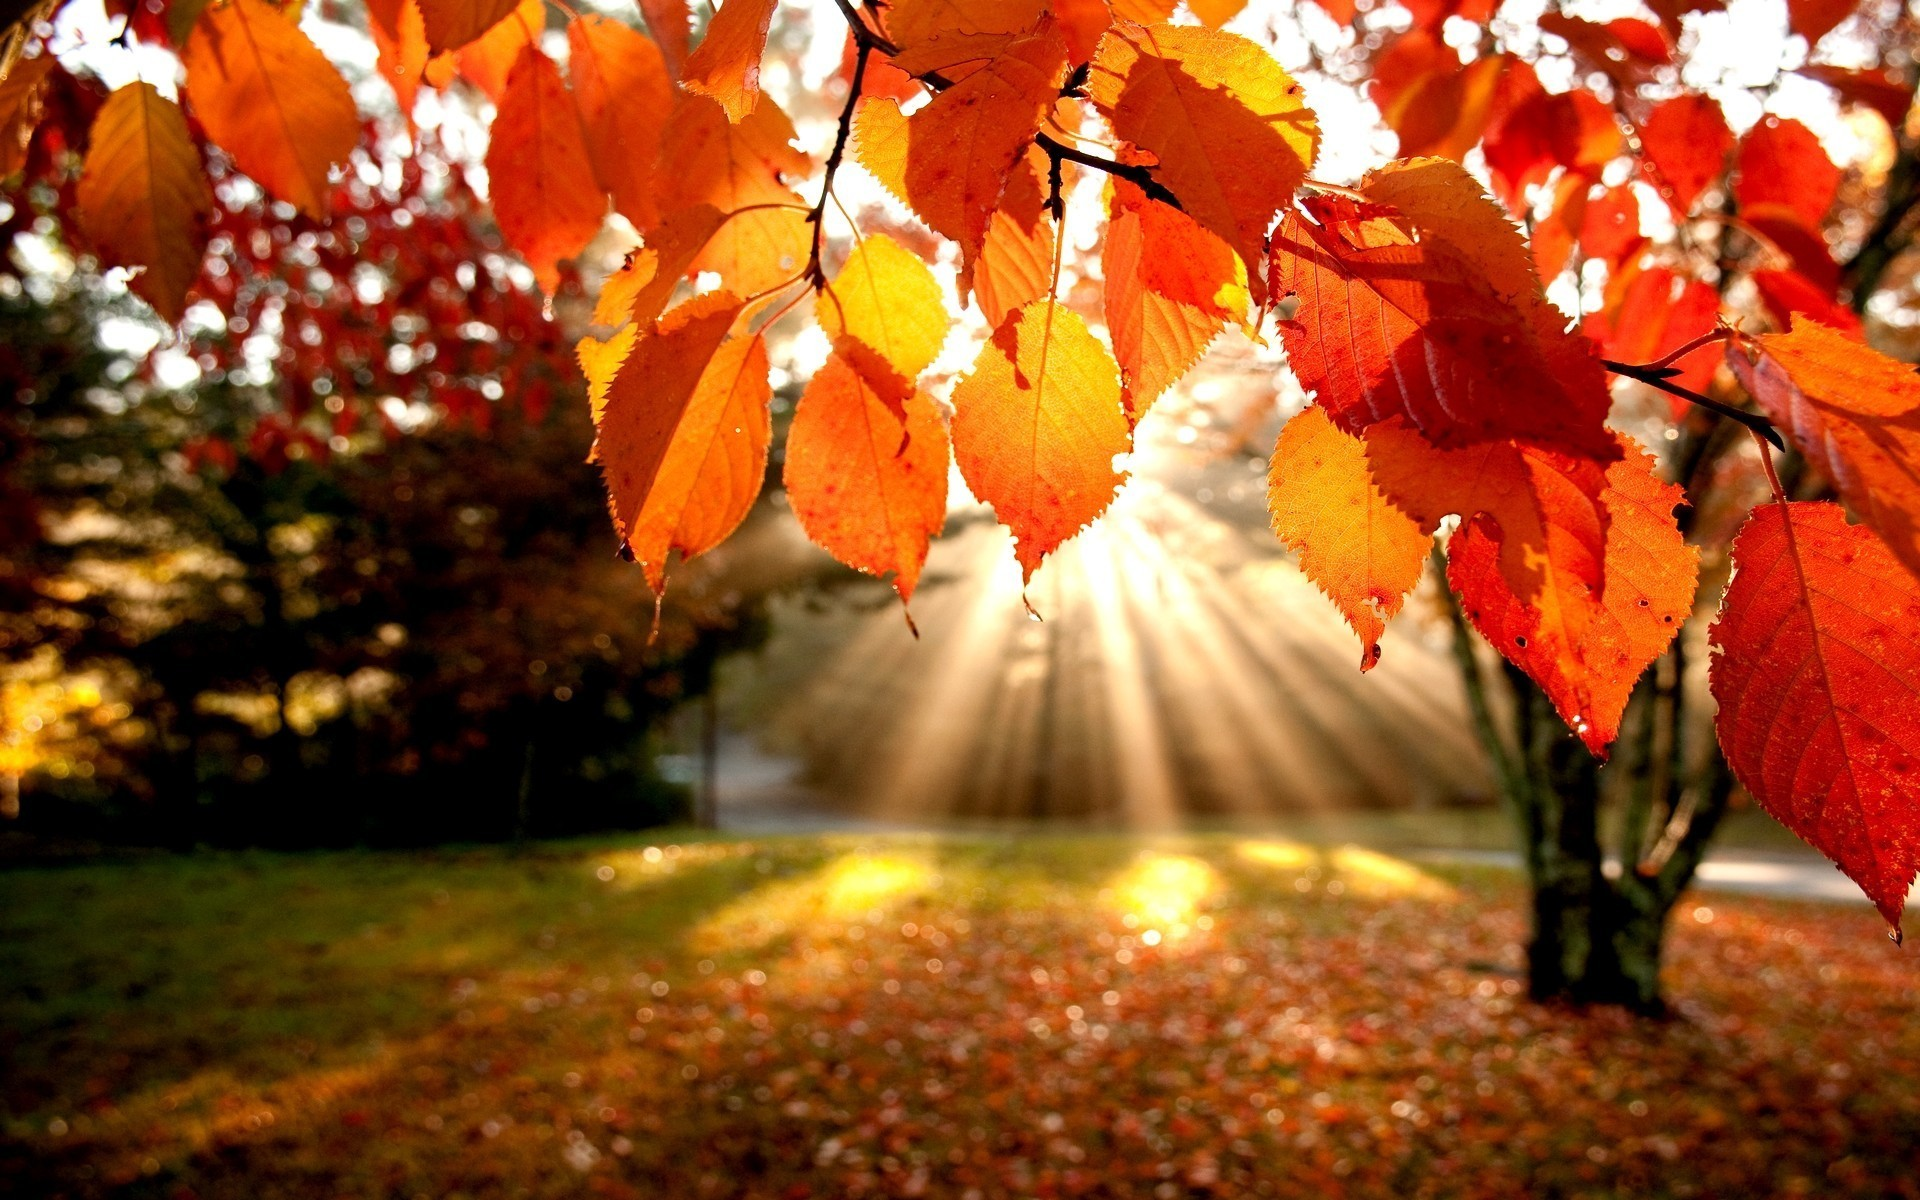 Fall Leaves Wallpapers for Desktop, wallpaper, Fall Leaves Wallpapers .